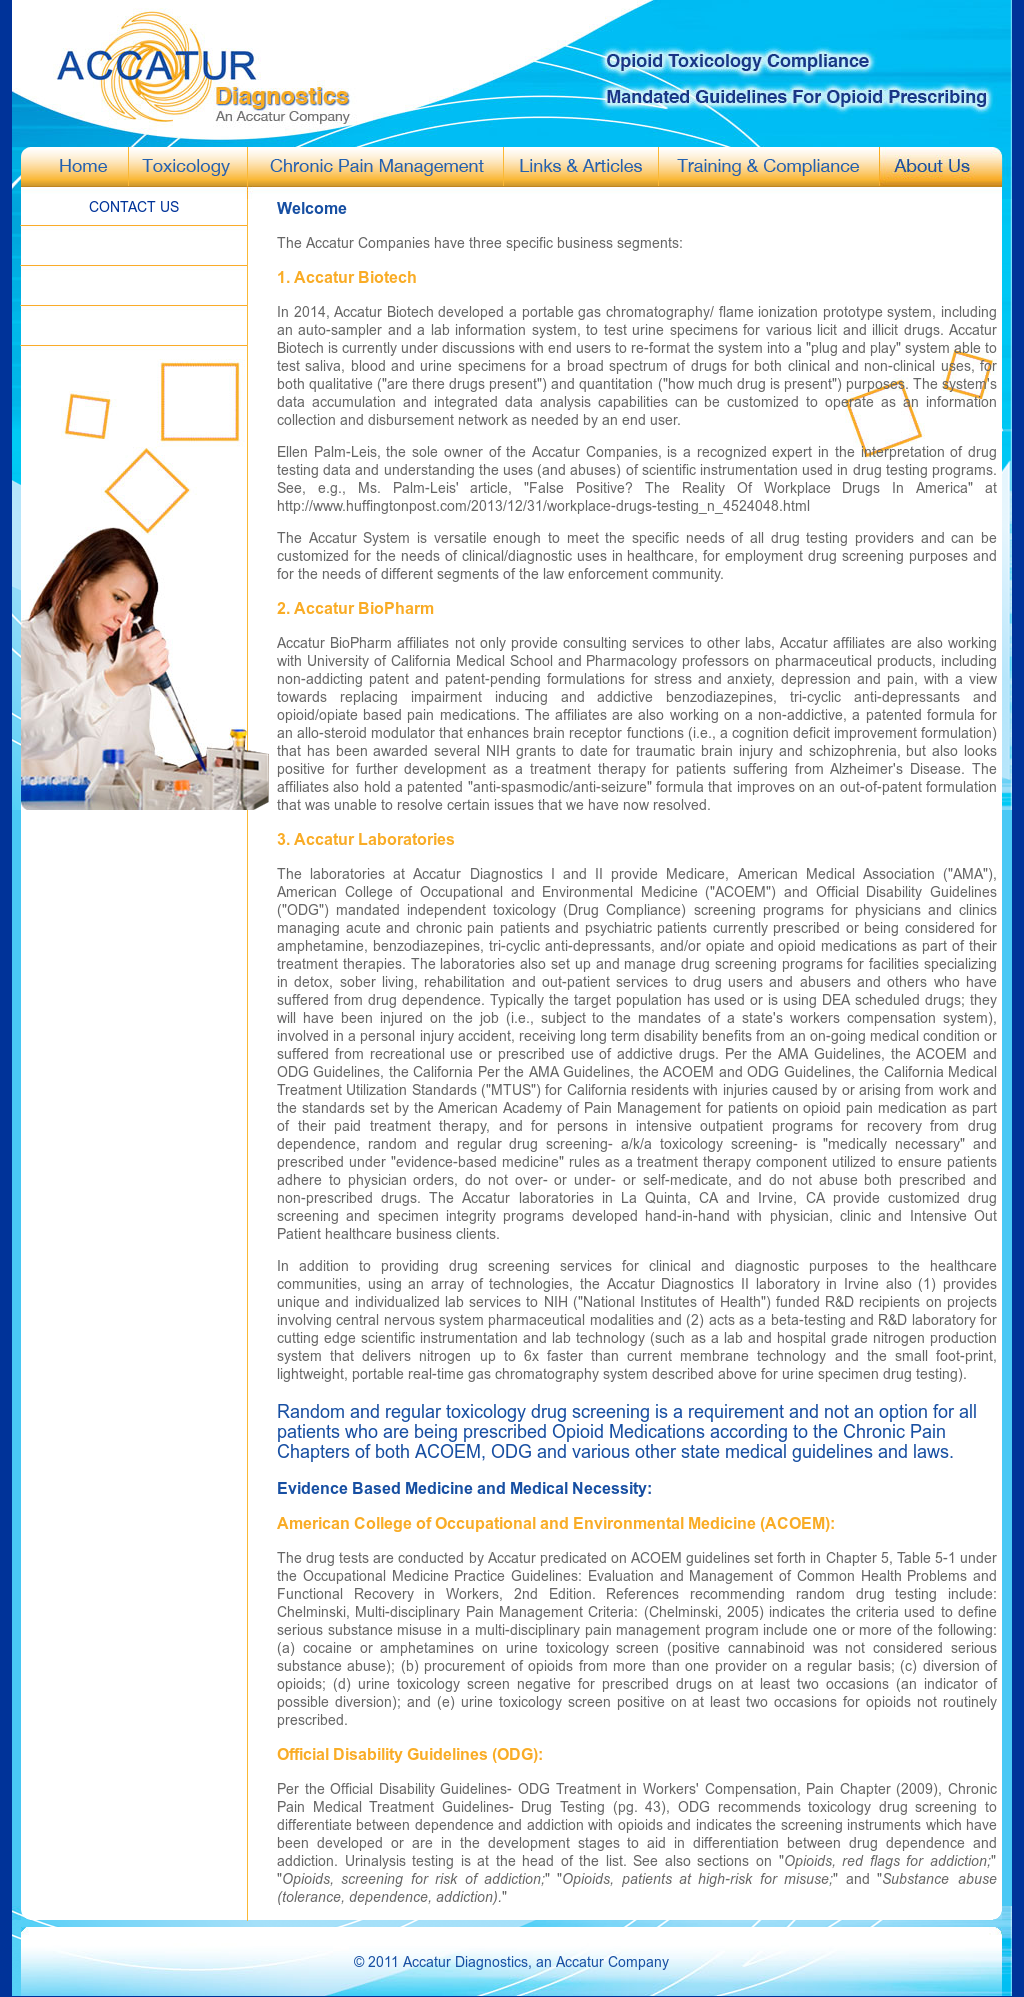 Accatur Diagnostics, An Accatur Company Competitors, Revenue